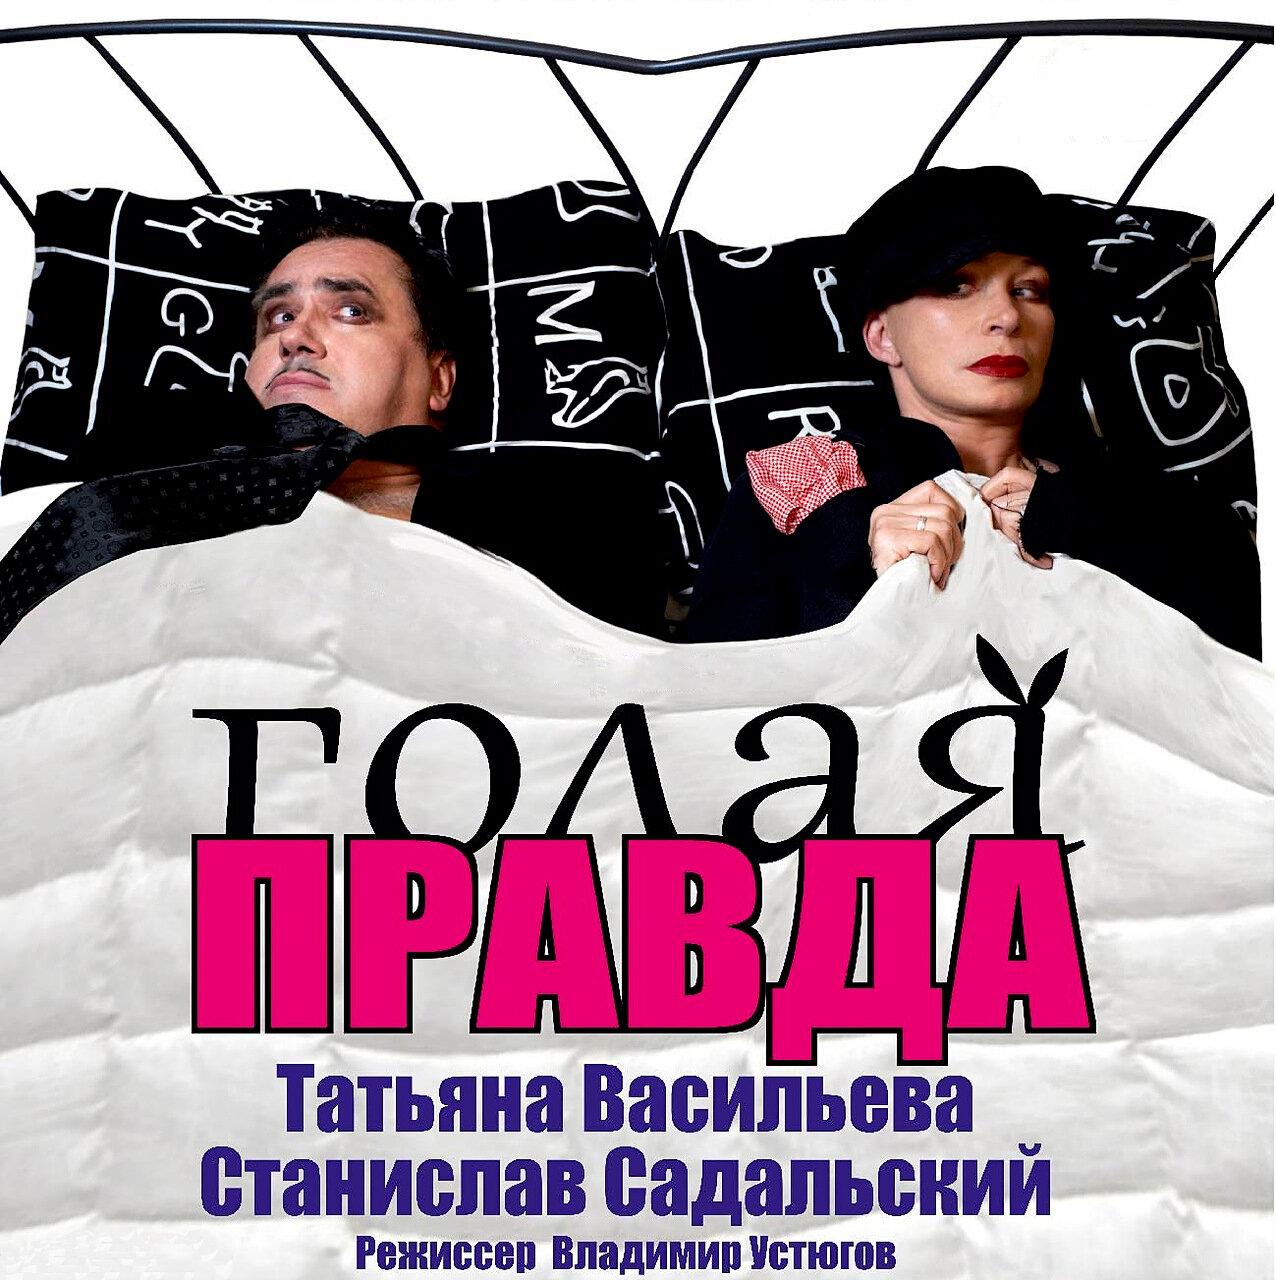 https://img-fotki.yandex.ru/get/6815/39067198.138/0_93553_731fa81_XXXL.jpg